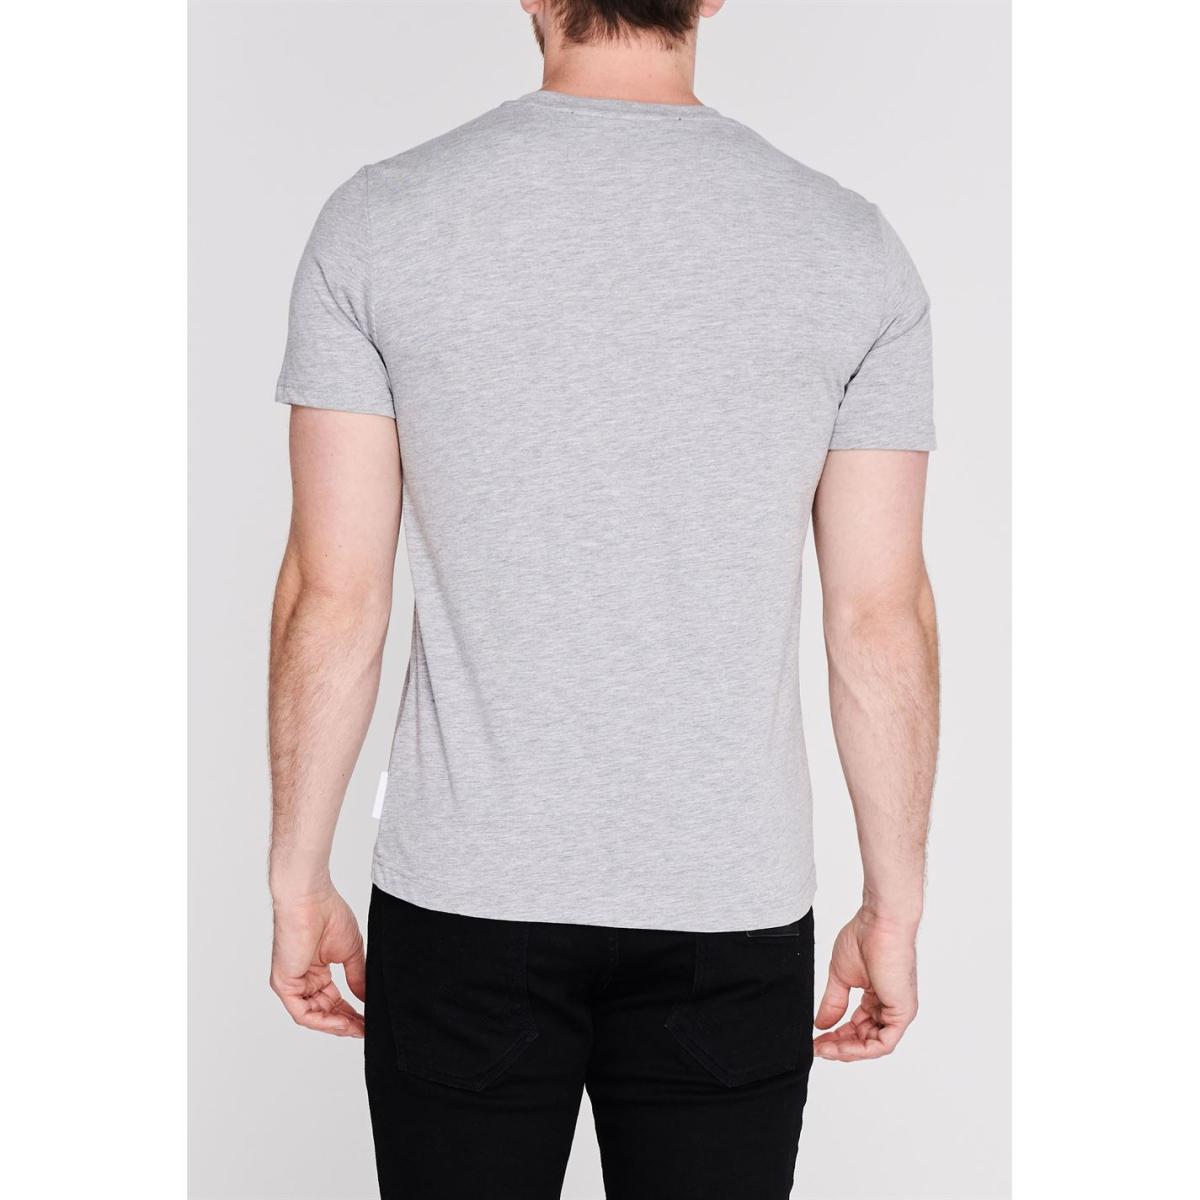 New Balance Herren T-shirt Tshirt T Shirt Kurzarm Jogging Fitness 7010